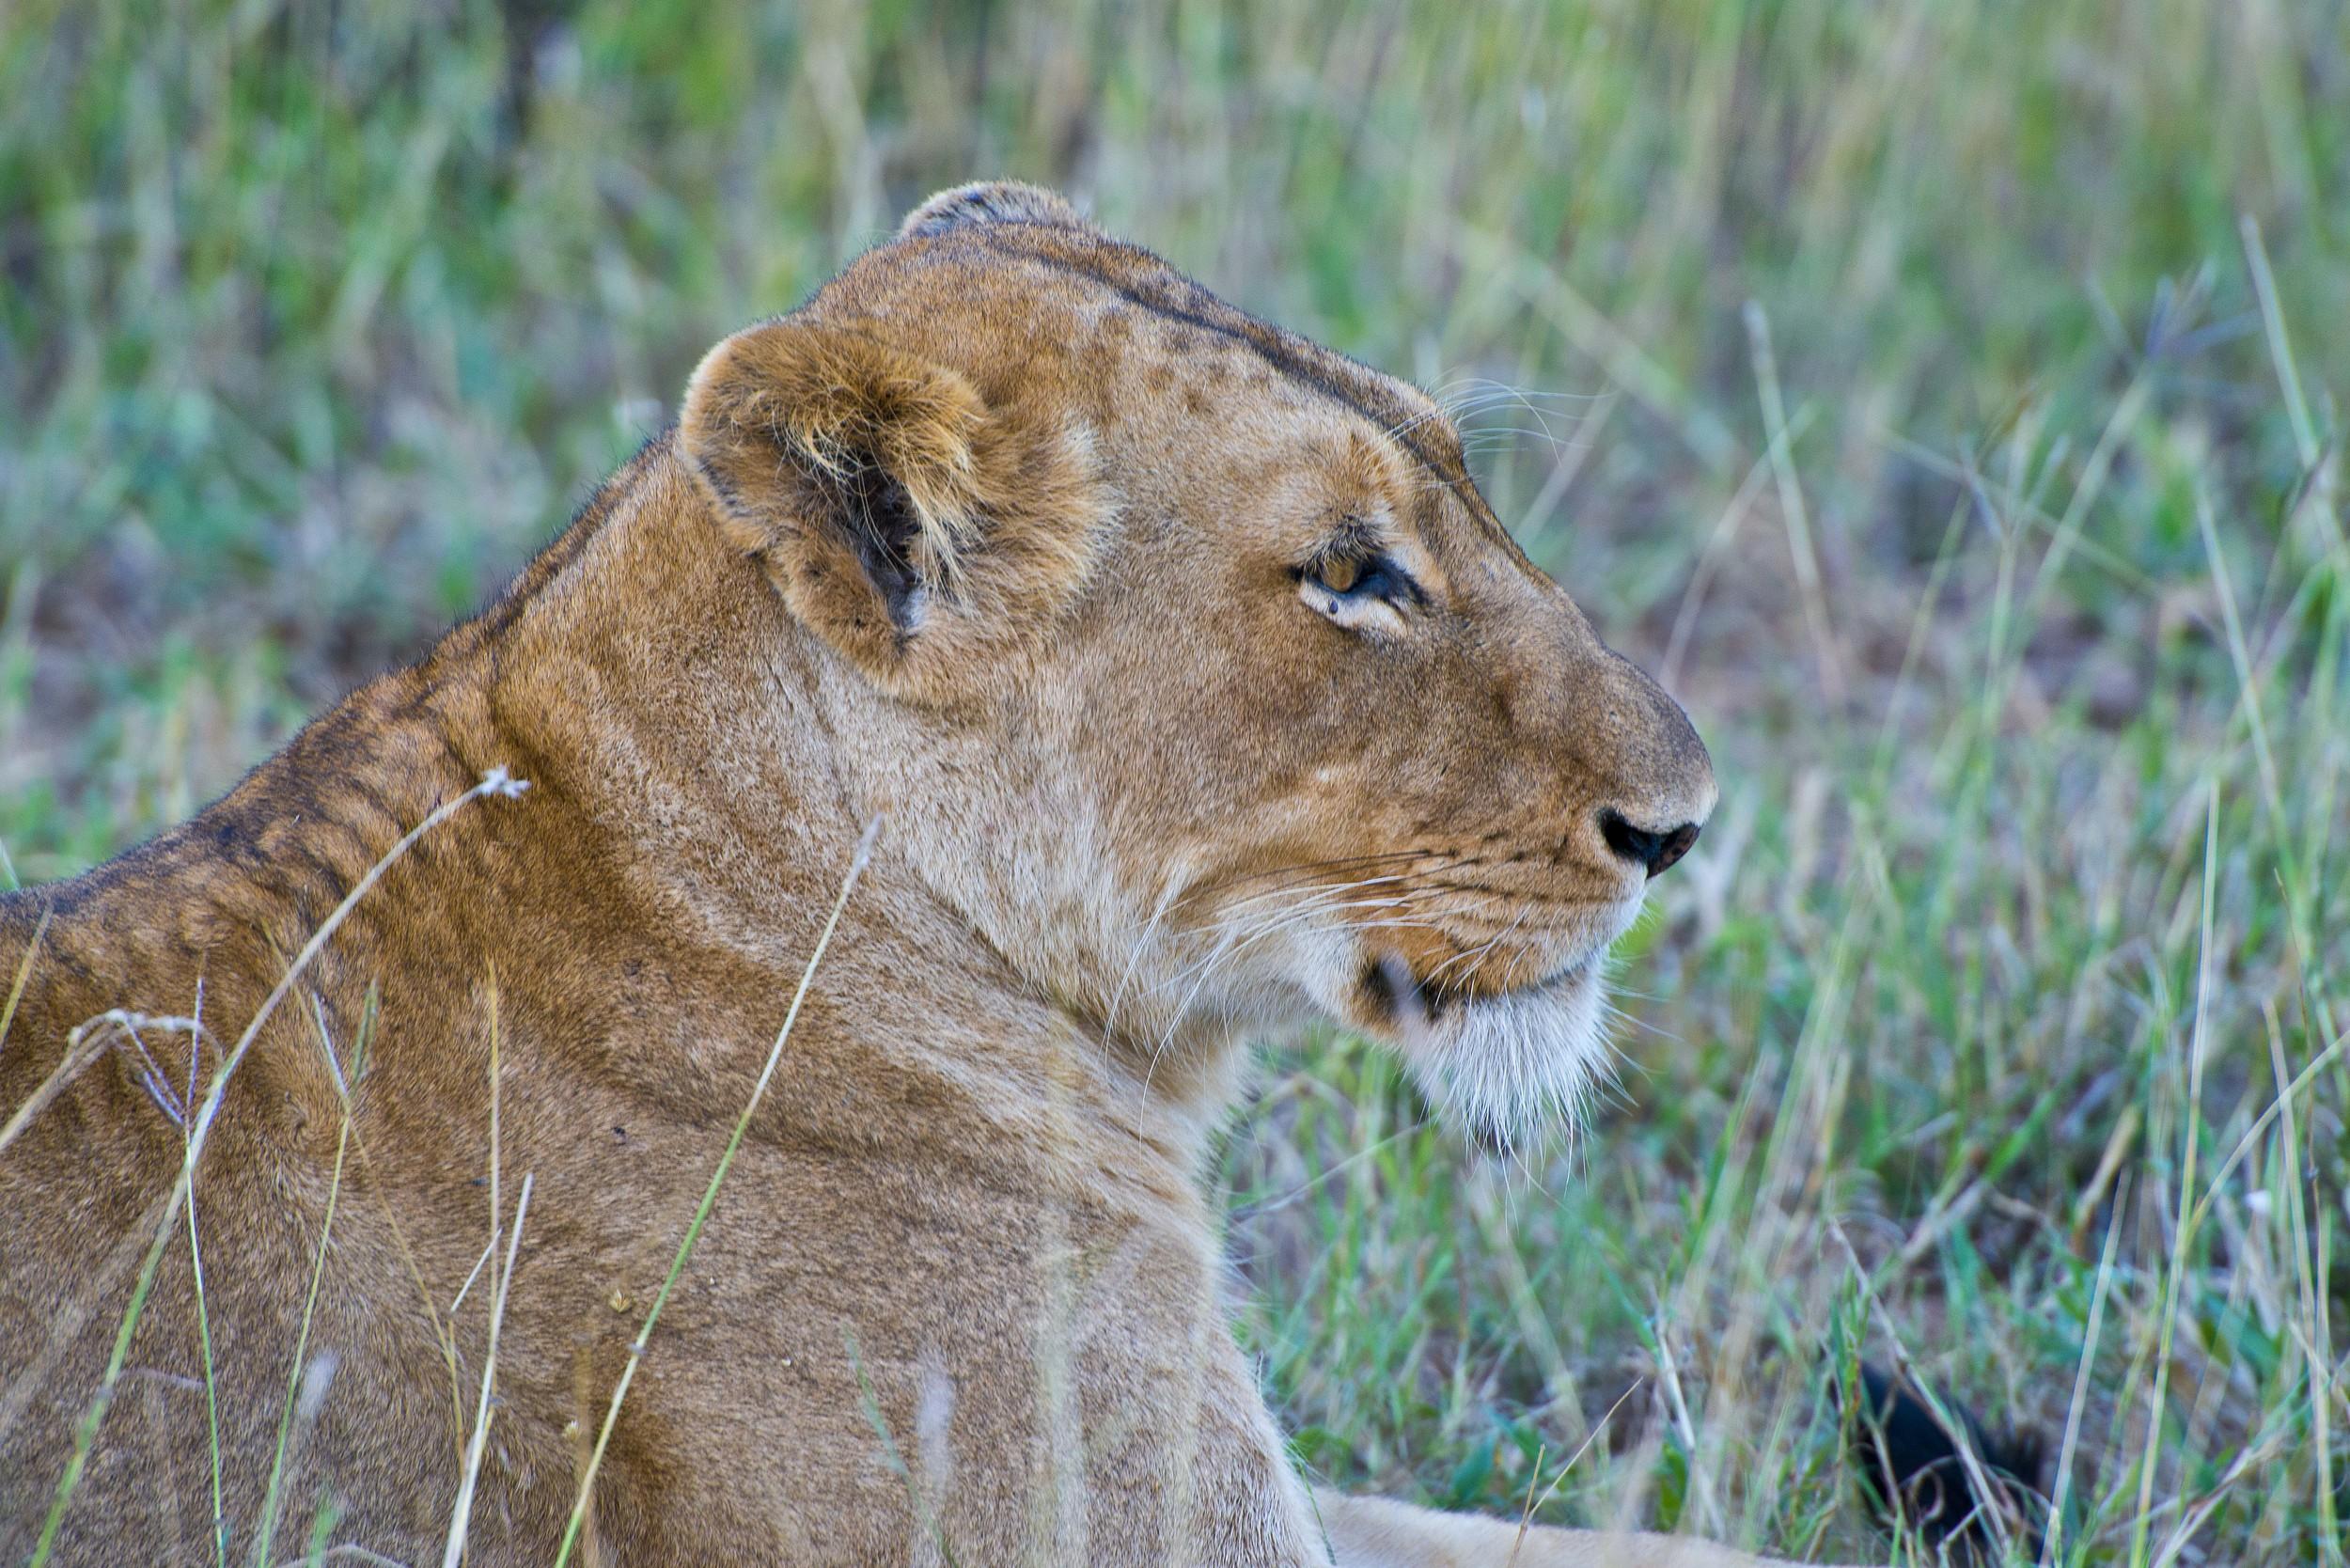 130420_DSC3036 Lioness in the Grass.jpg